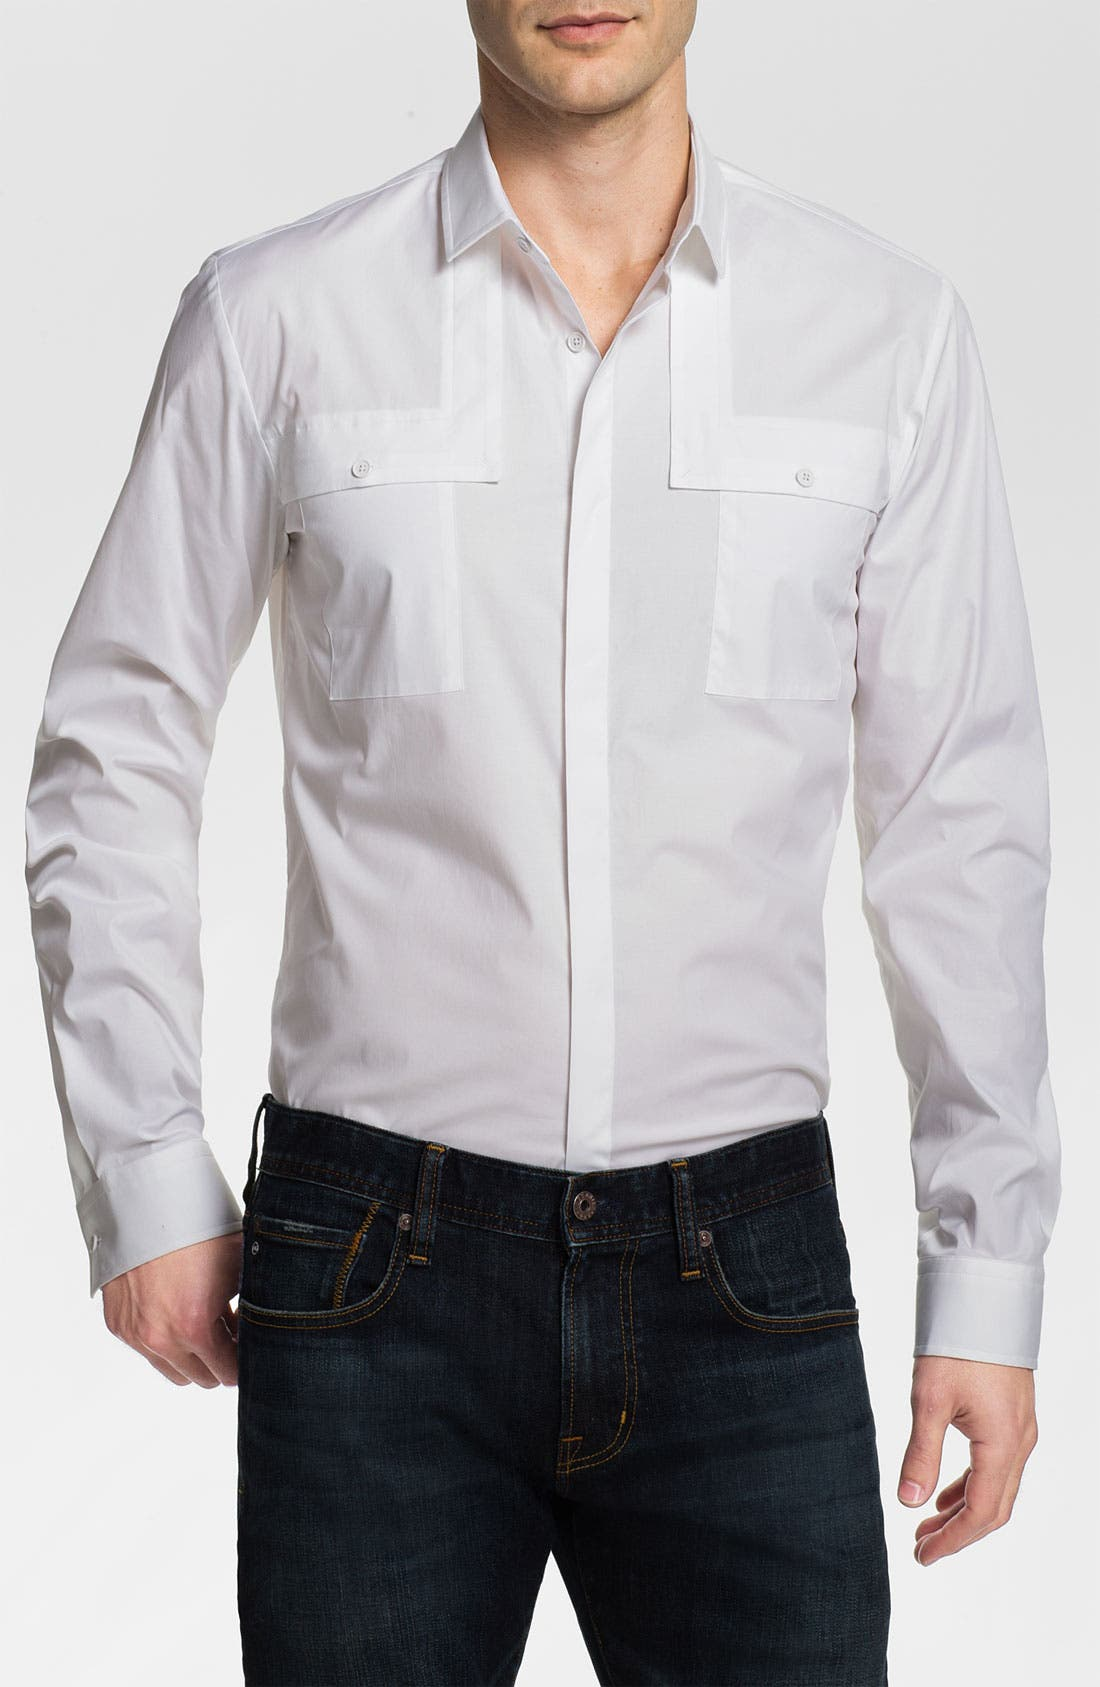 Alternate Image 1 Selected - HUGO 'Eleo' Slim Fit Sport Shirt